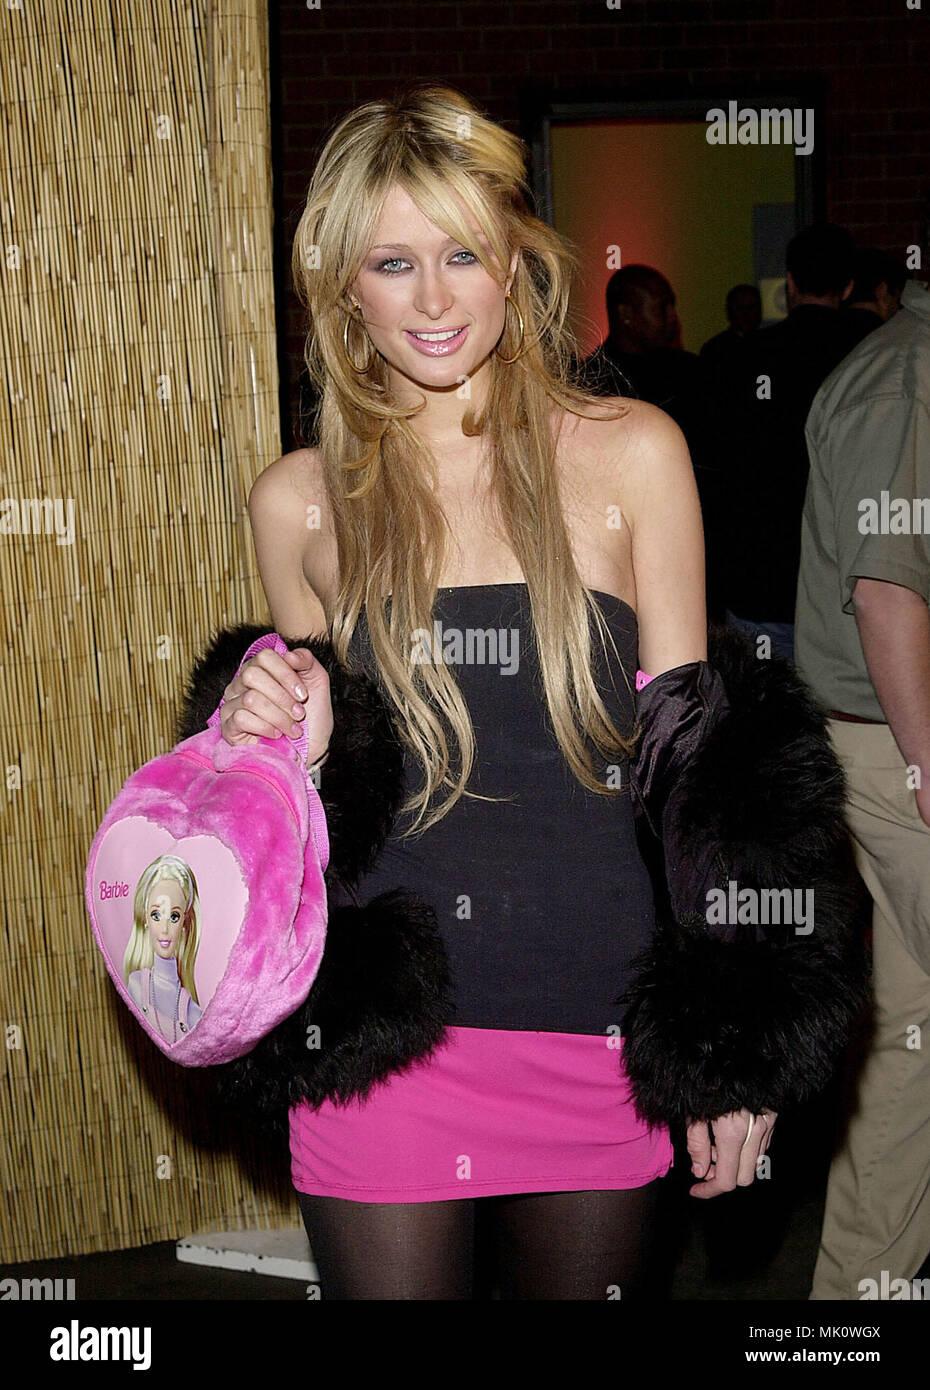 underwear Celebrity Georgina Grenville naked photo 2017